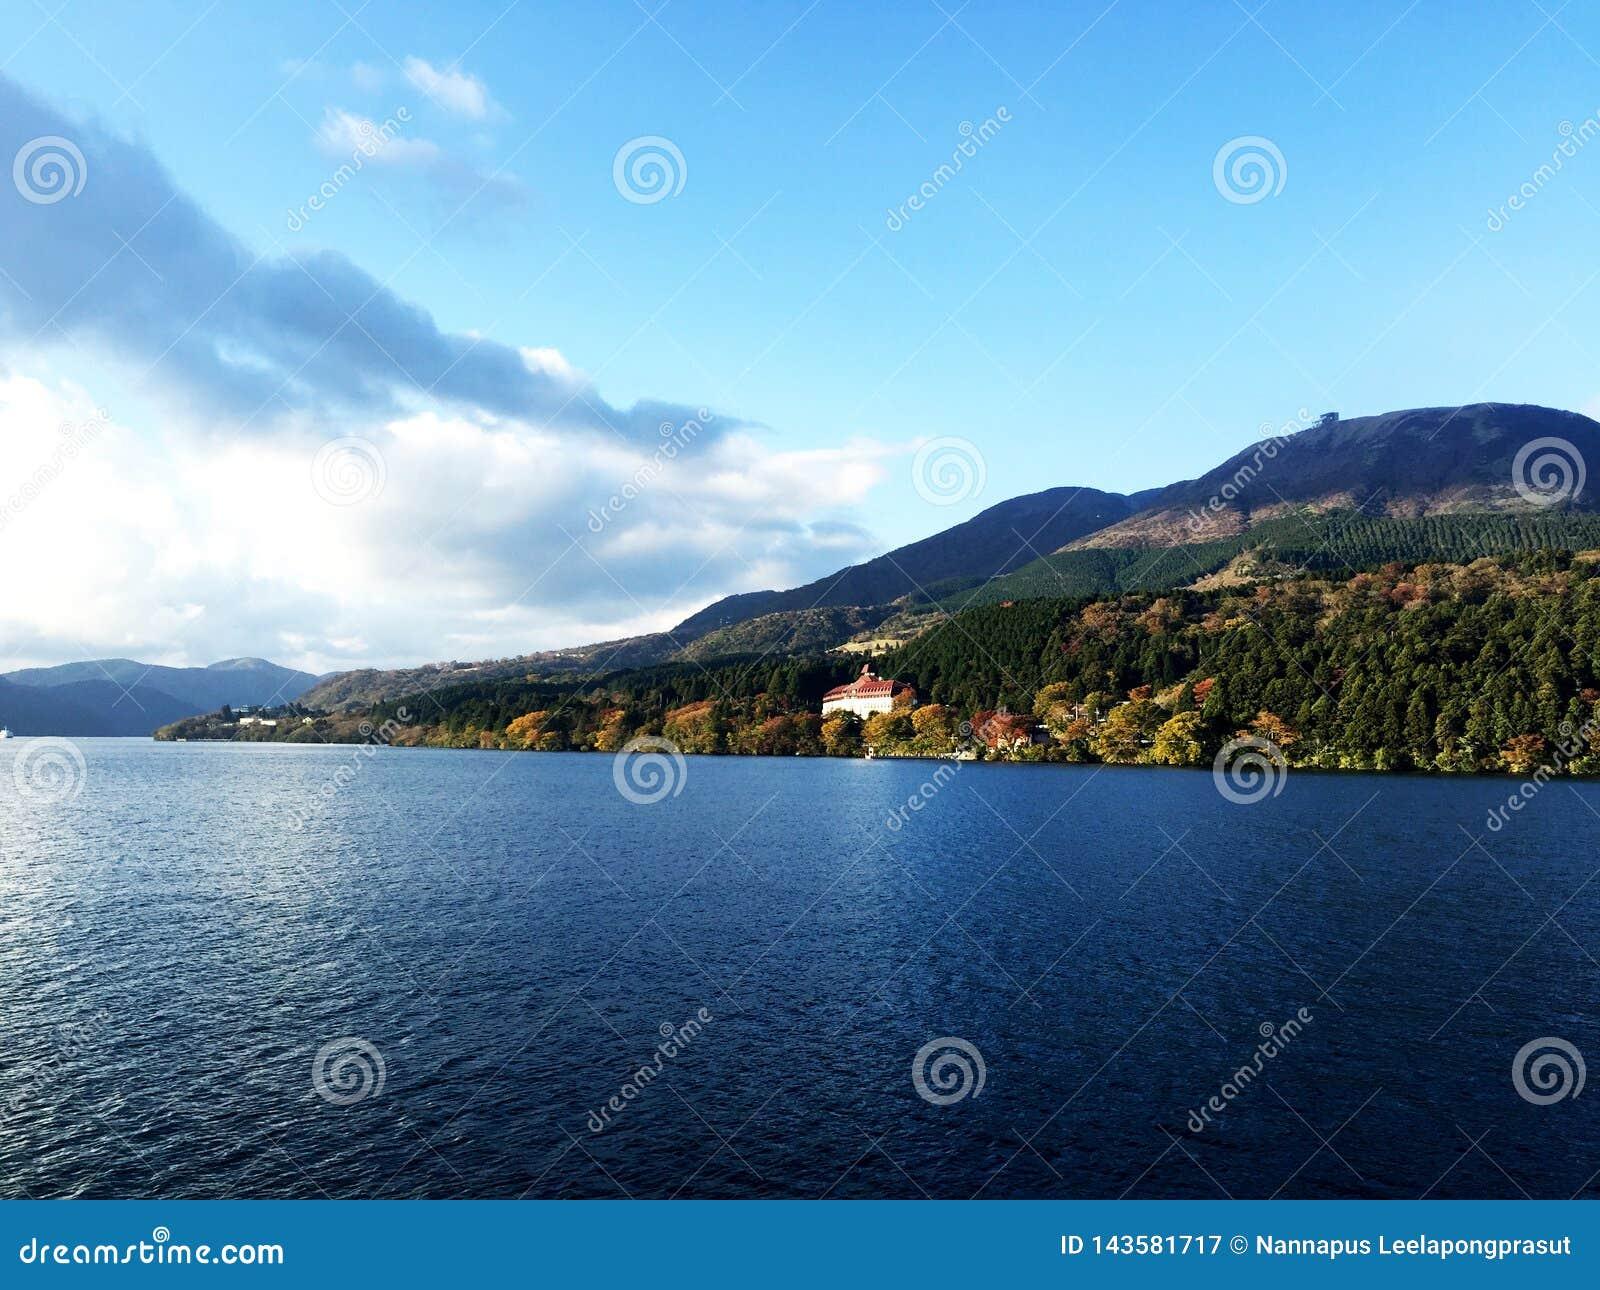 Lake sky mountain cloud sunlight